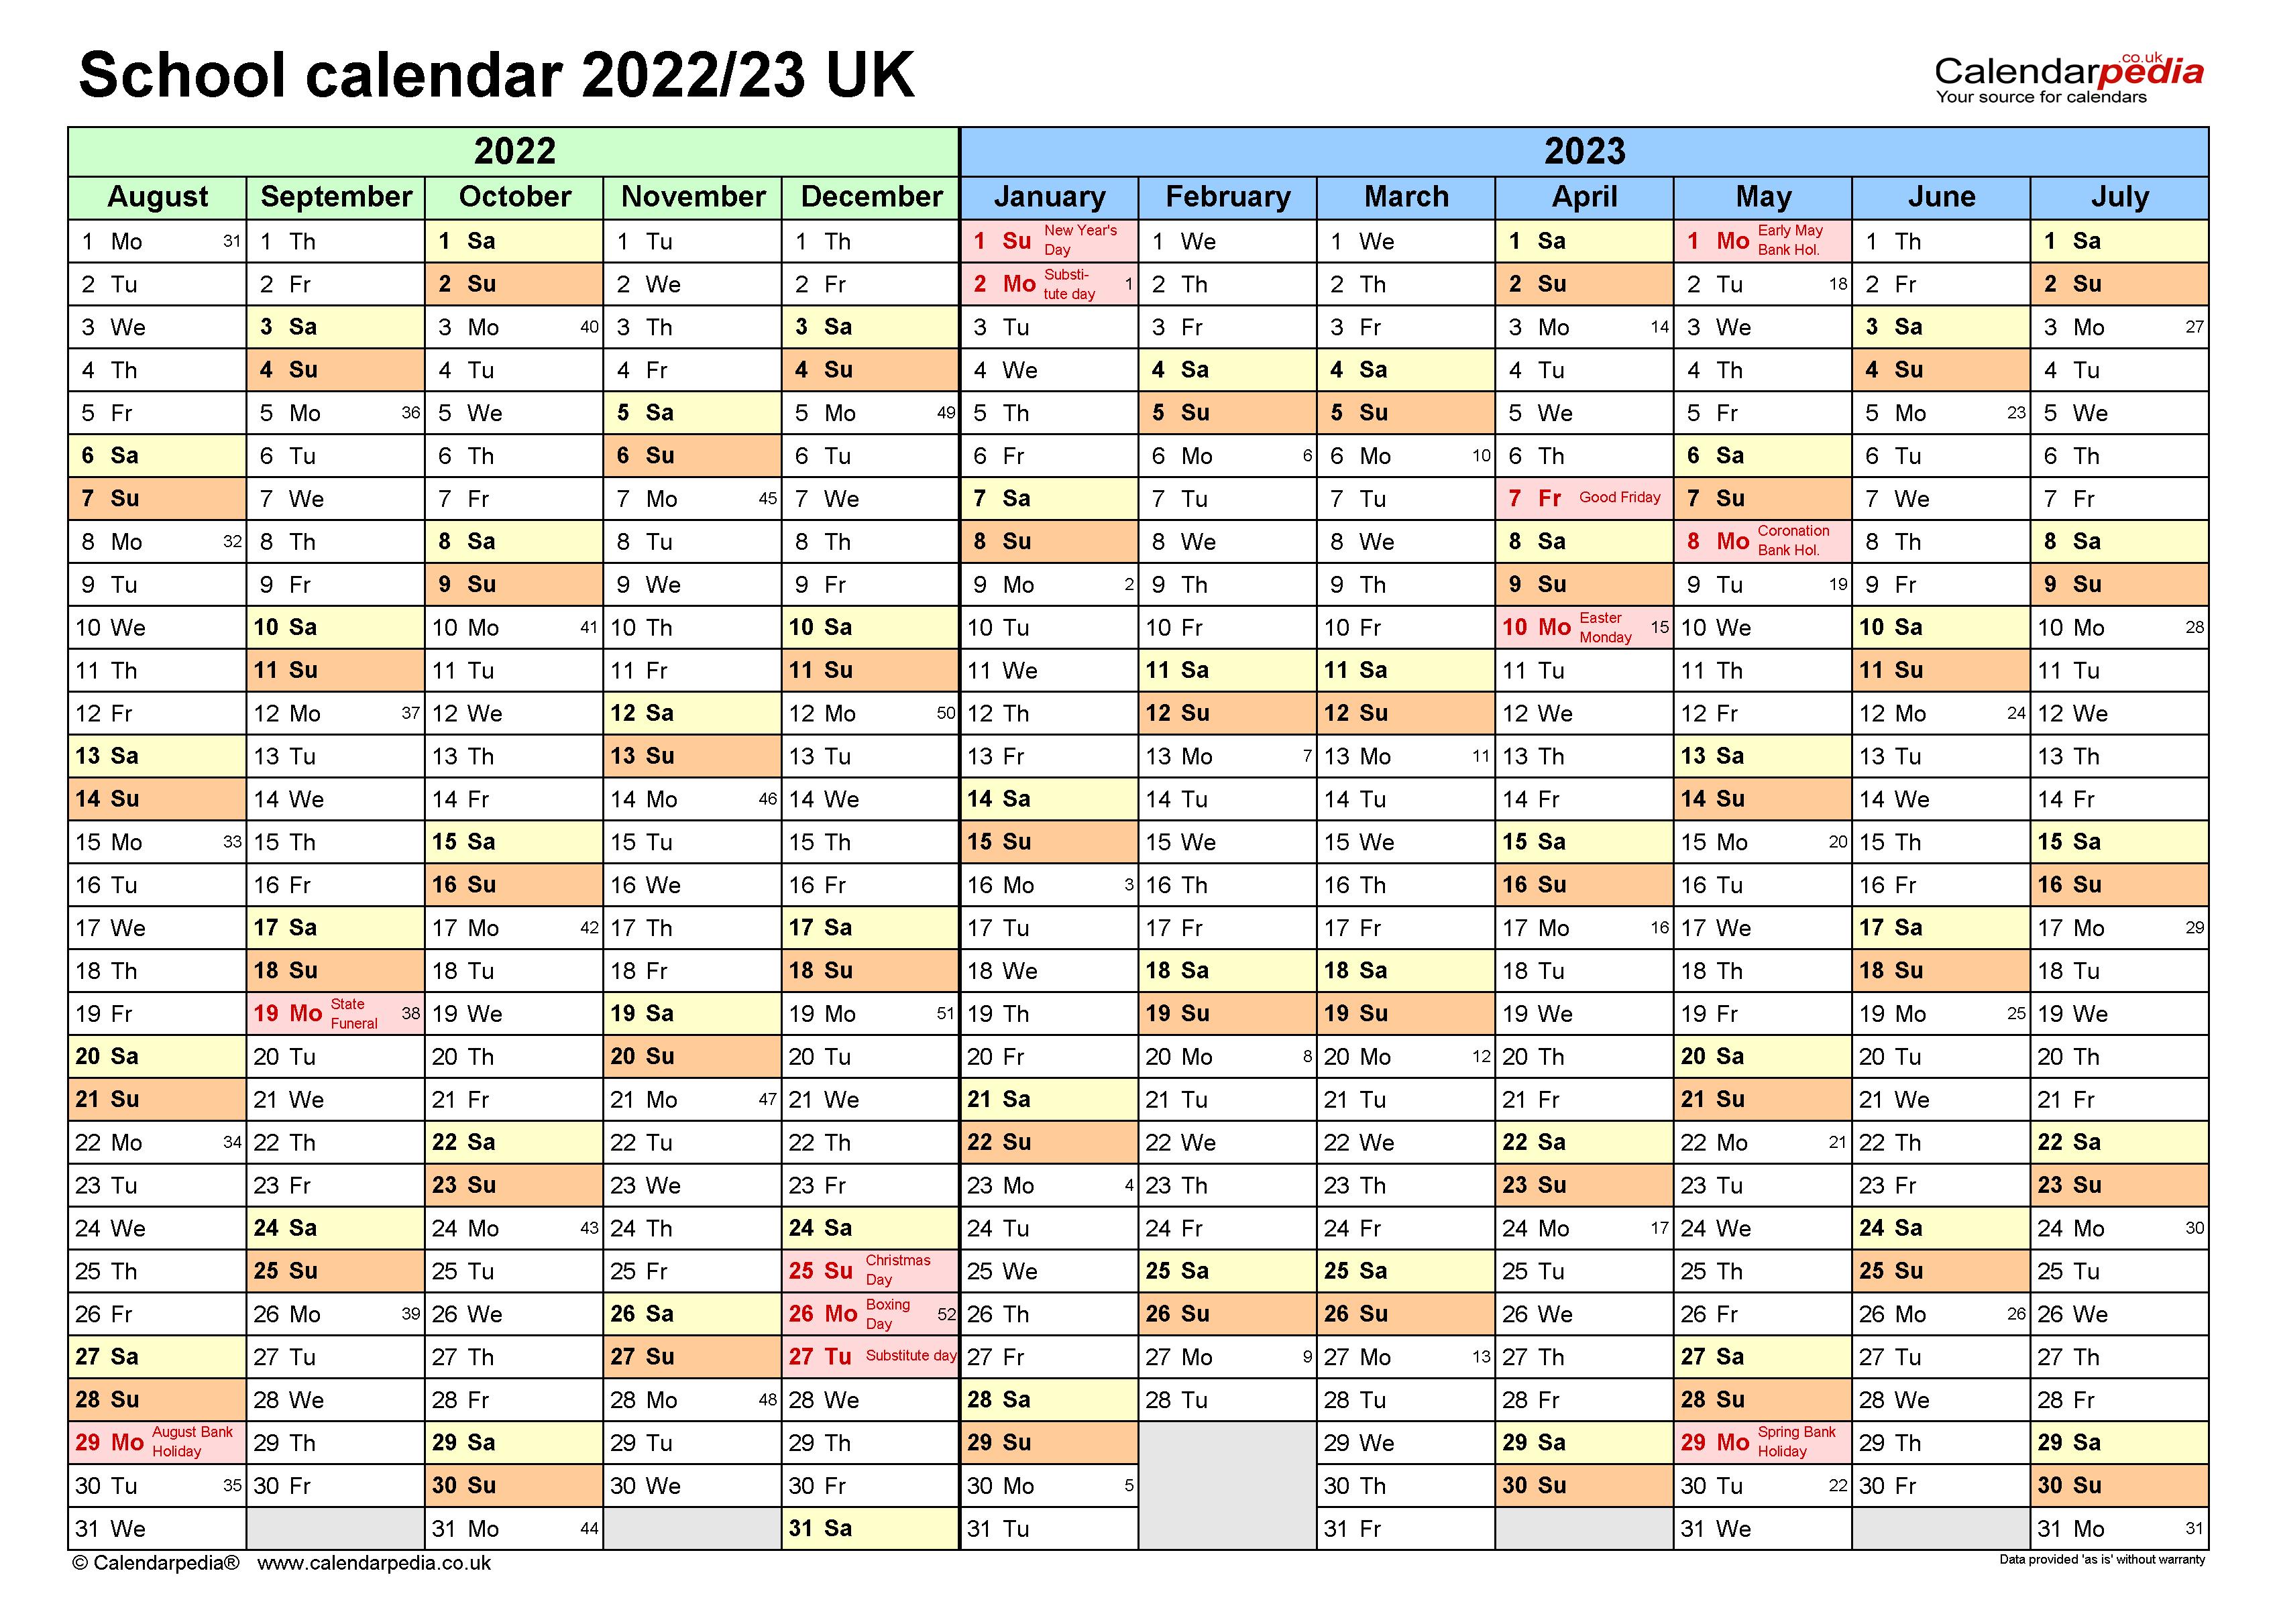 Umn Academic Calendar 2022 23.School Calendars 2022 23 Uk Free Printable Excel Templates